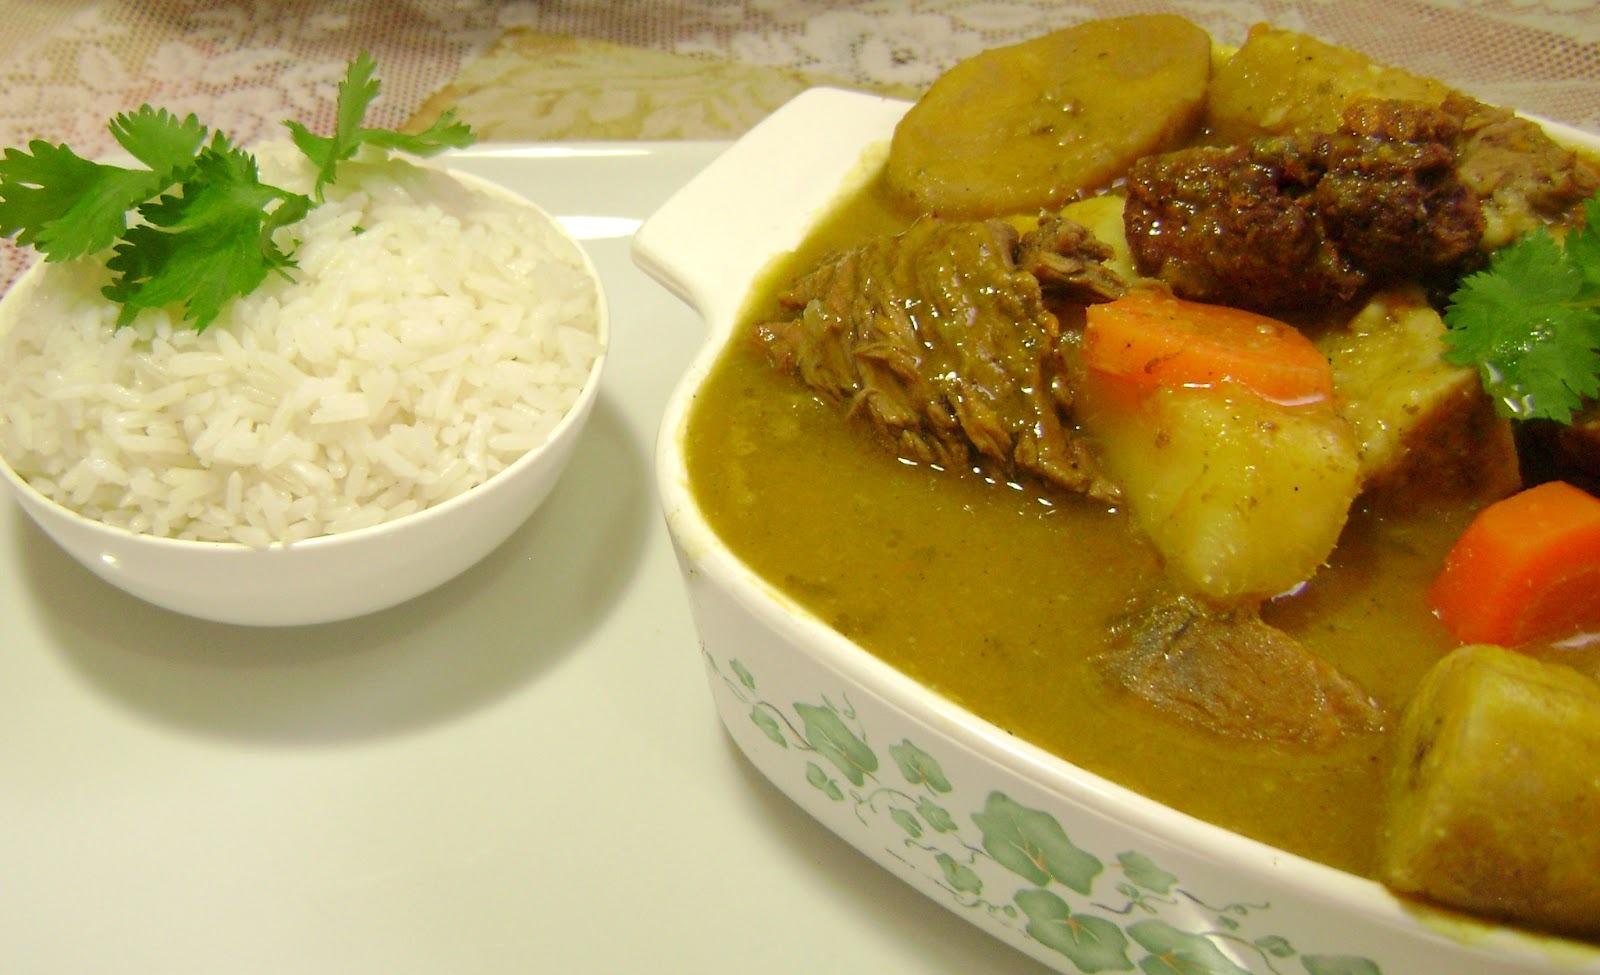 la comida dominicana tipica sancocho dominicano